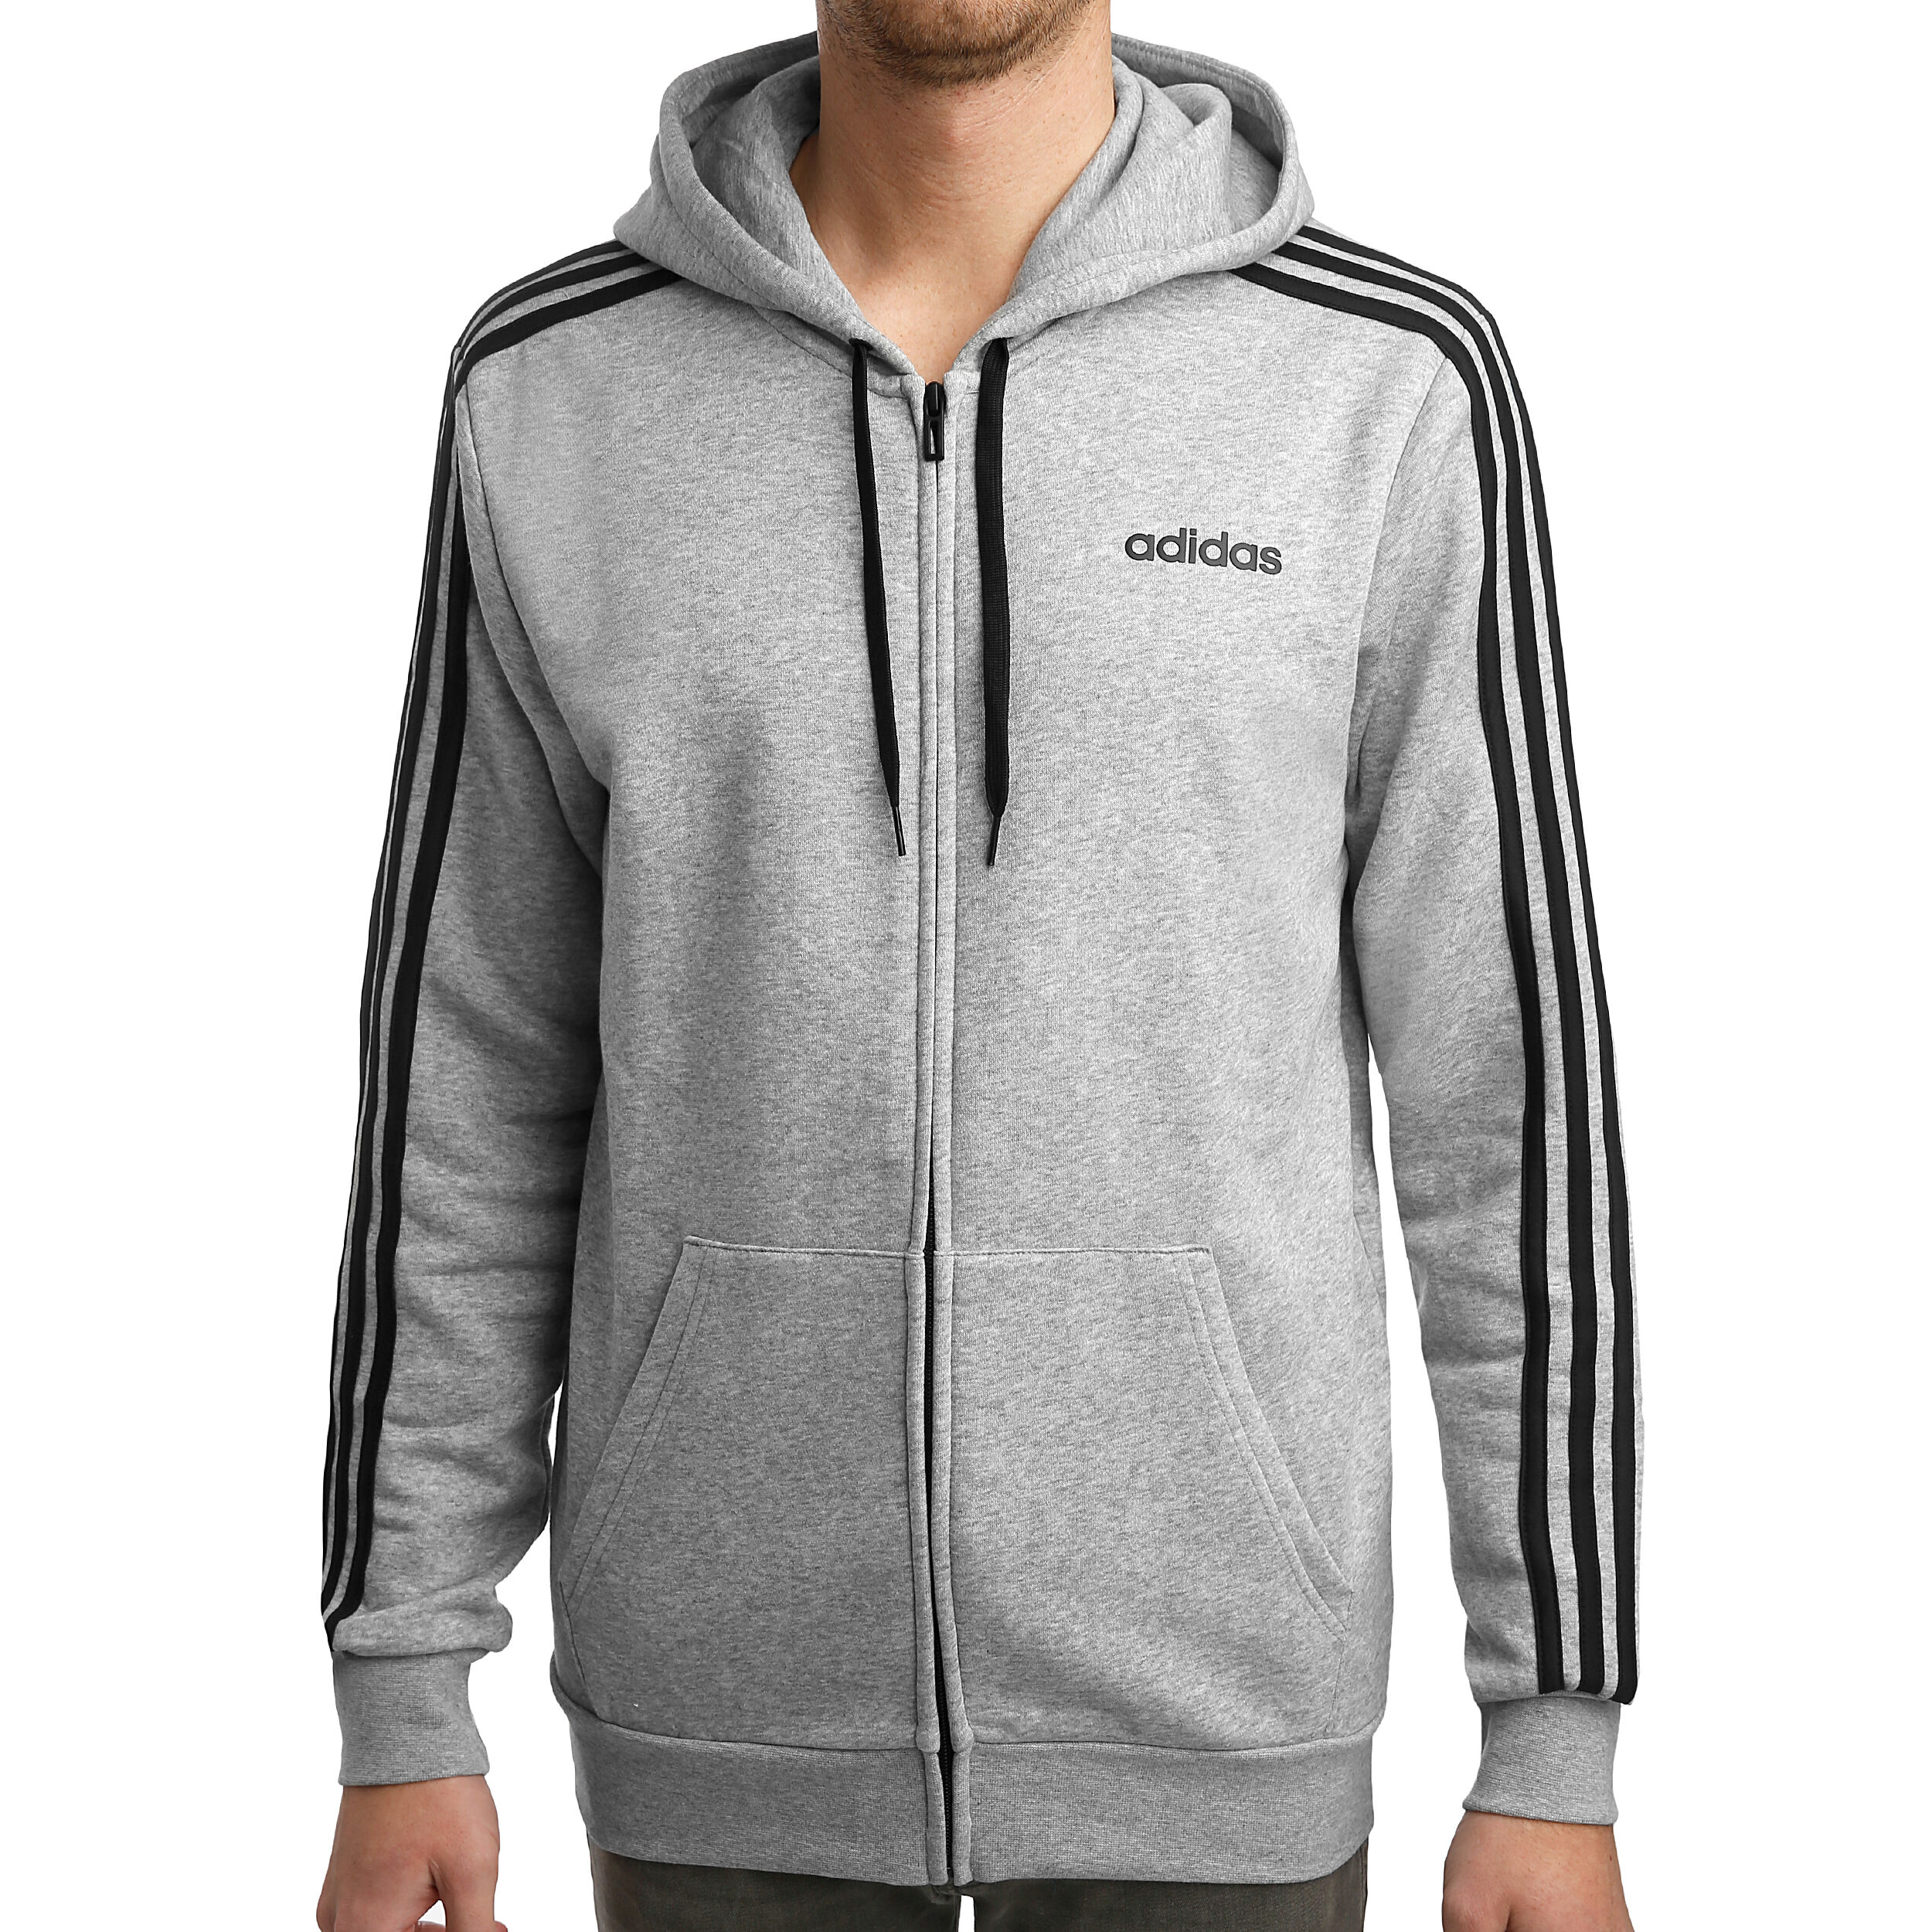 adidas Essentials 3 Stripes Sweatjacke Herren Hellgrau